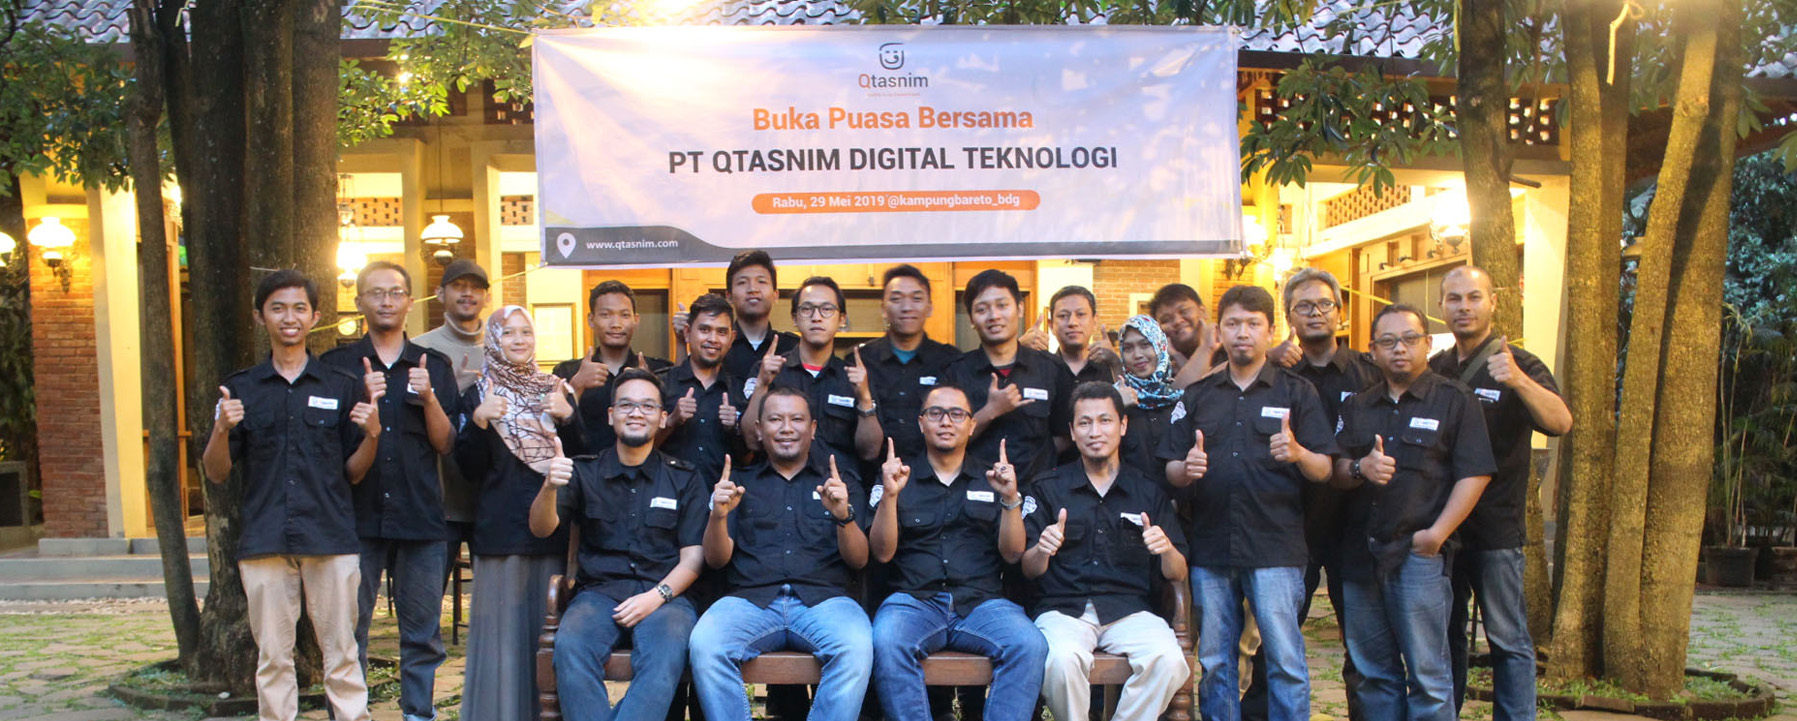 Qtasnim Digital Teknologi